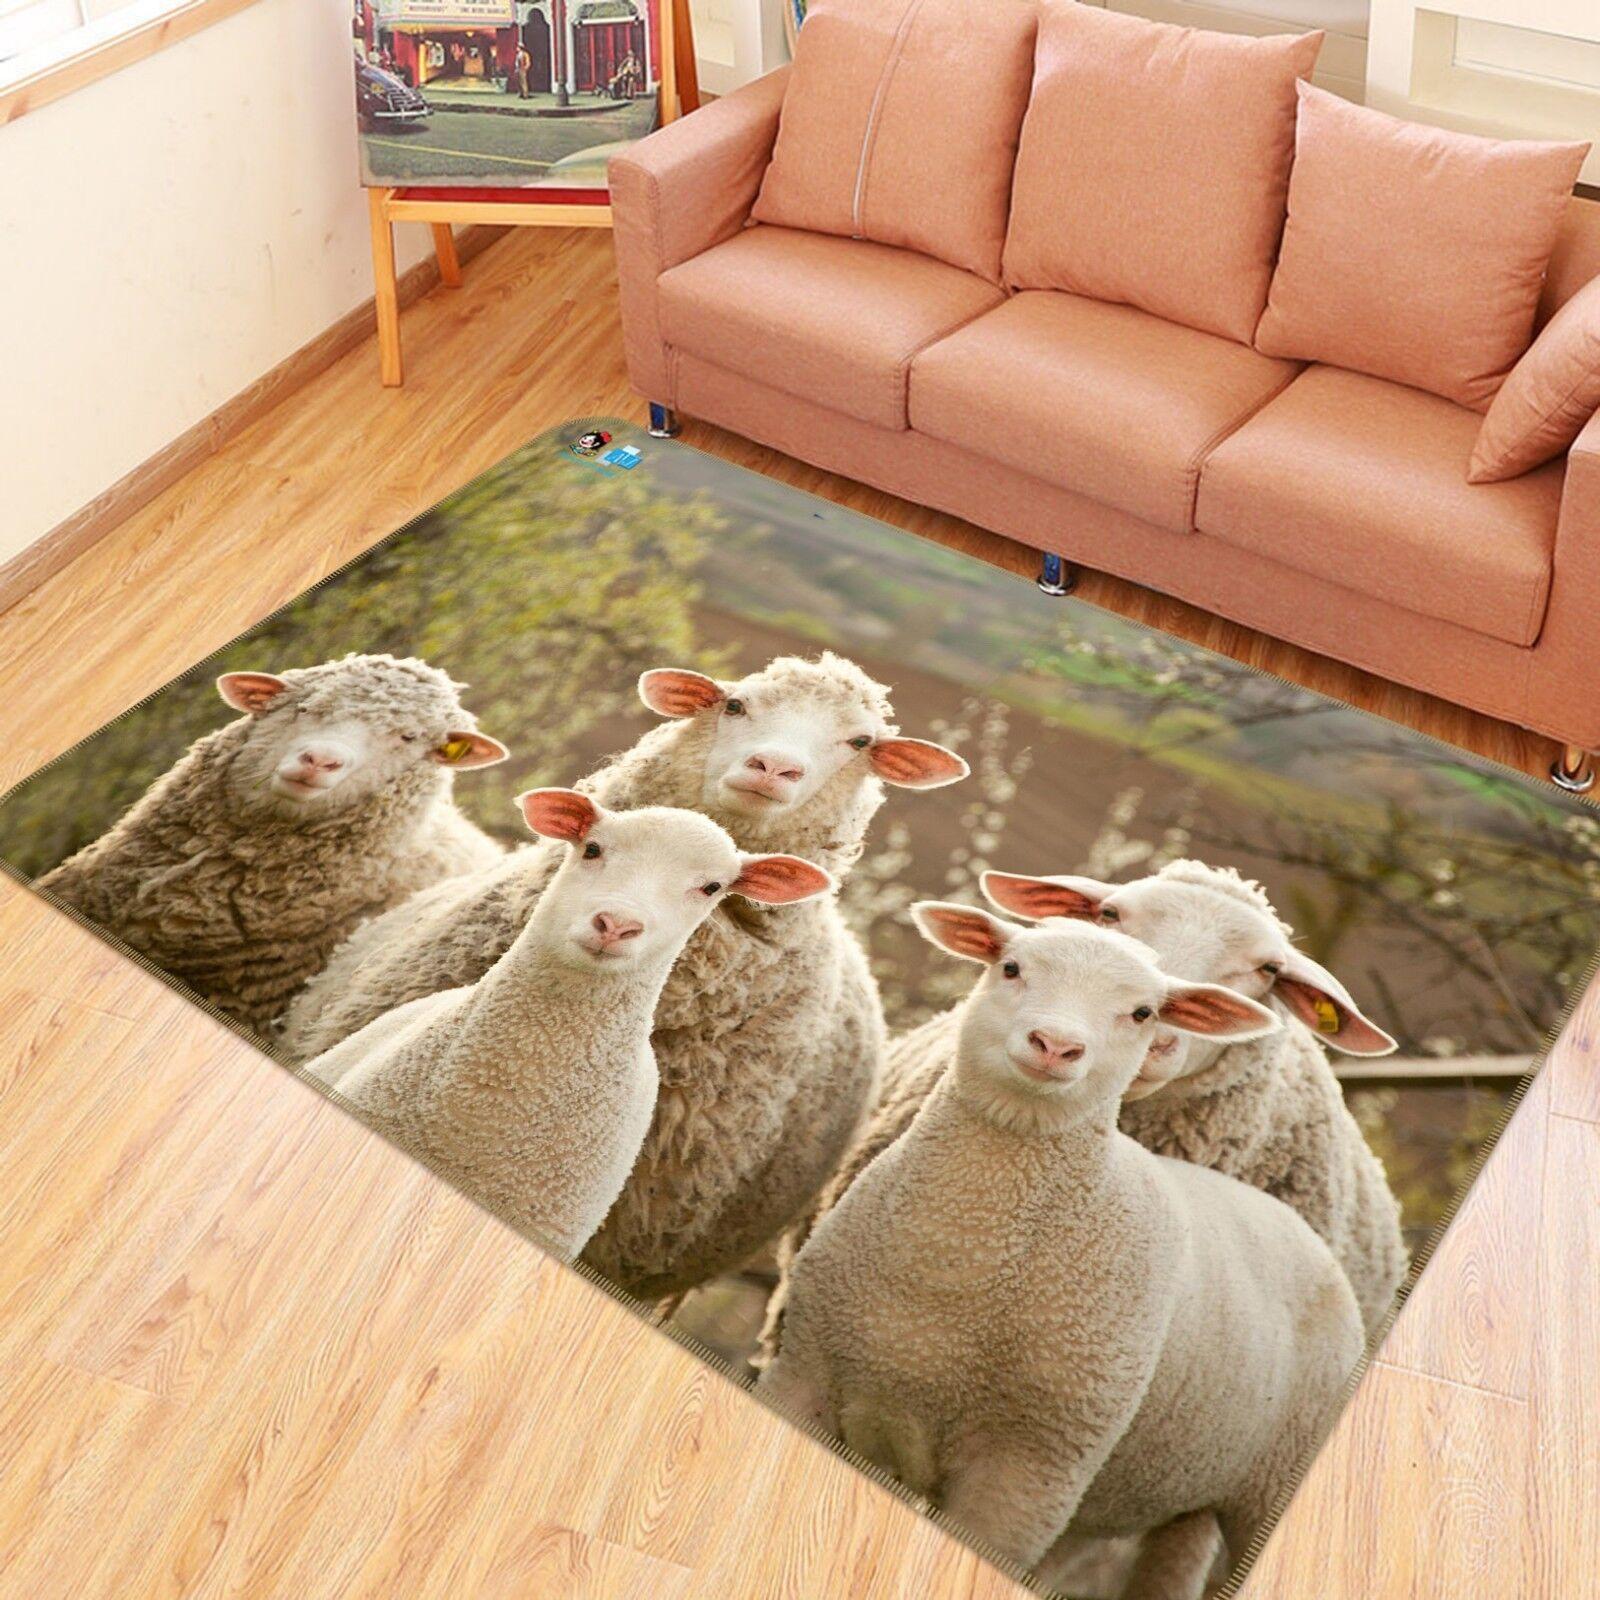 3D OVINI GRUPPO 566 tappetino antiscivolo tappeto camera Tappetino Qualità Elegante foto Tappeto UK